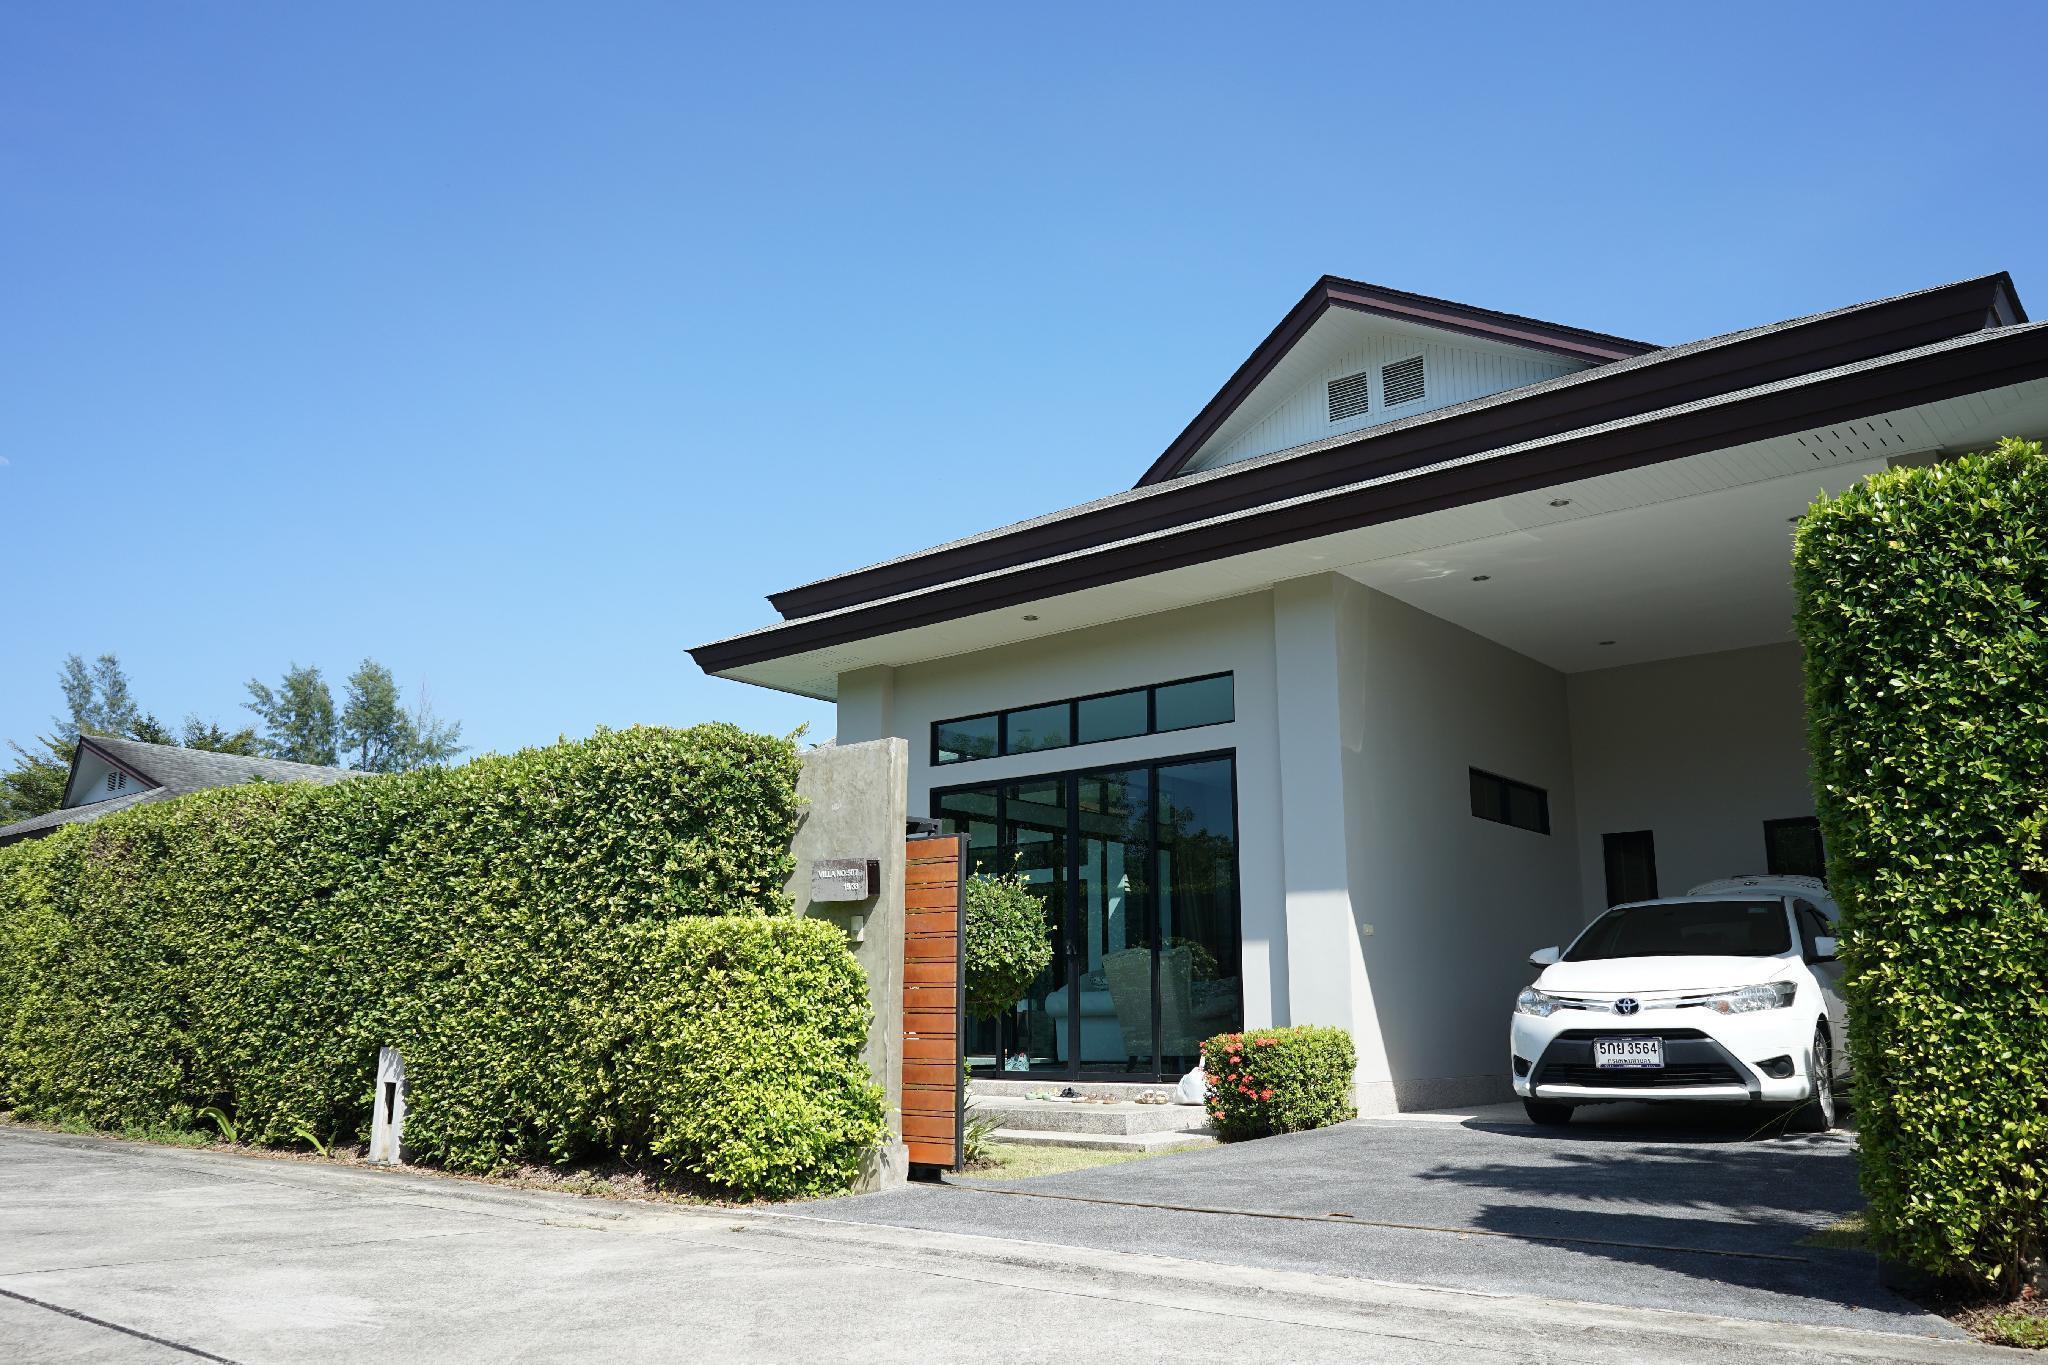 wei jian  phuket 3 bedroom swimming pool villa wei jian  phuket 3 bedroom swimming pool villa